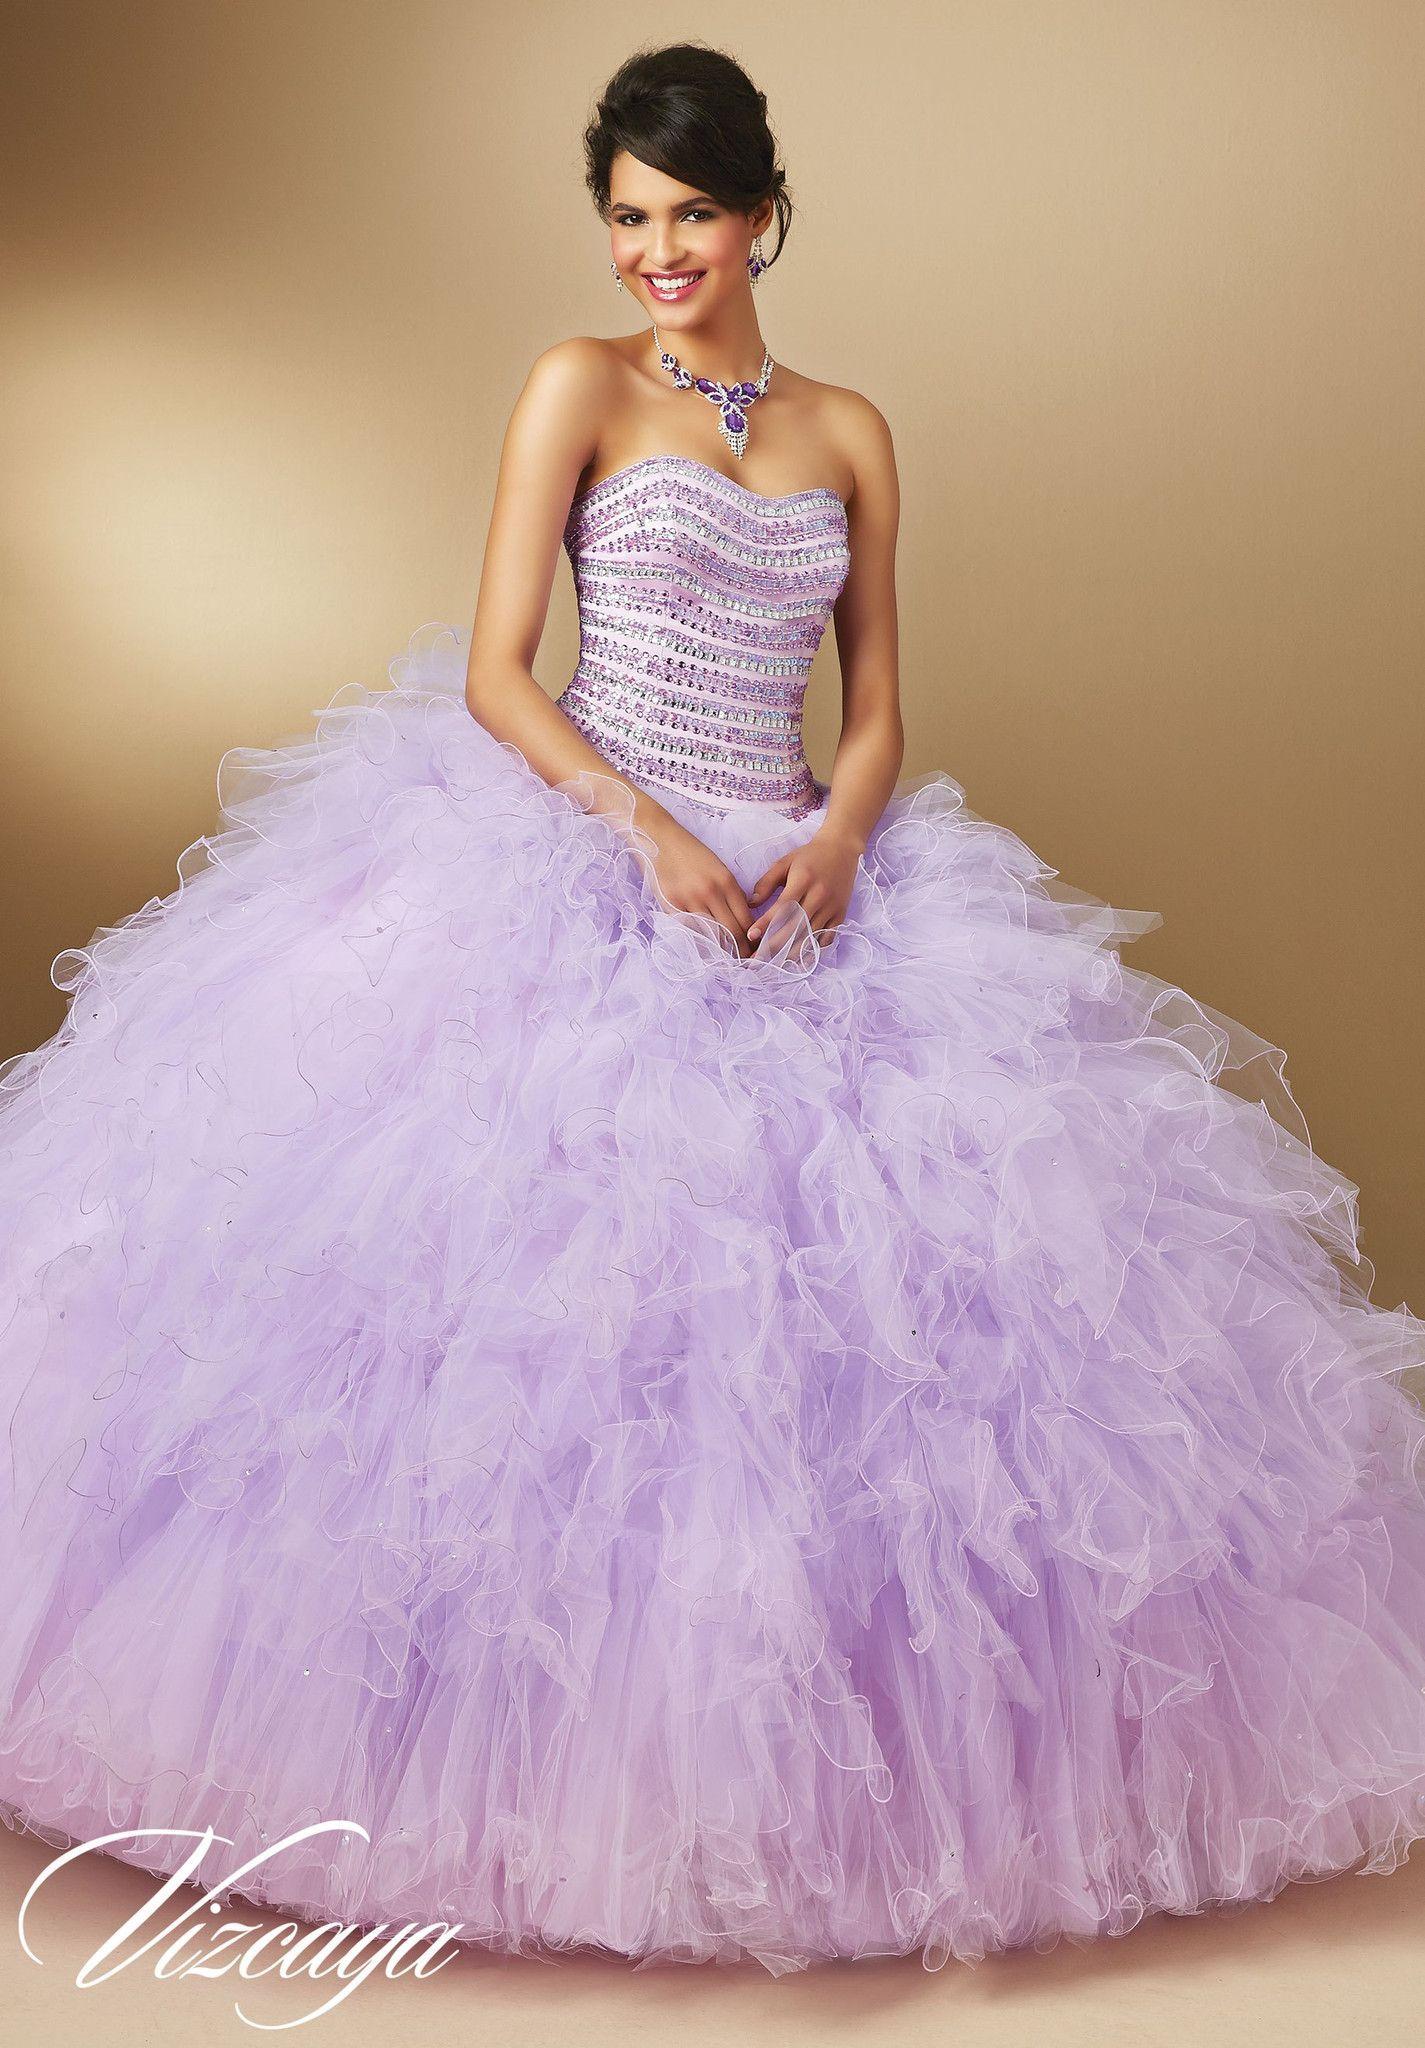 Turquoise wedding dresses  Mori Lee Quinceanera Dress   Mori lee Quinceanera and Products